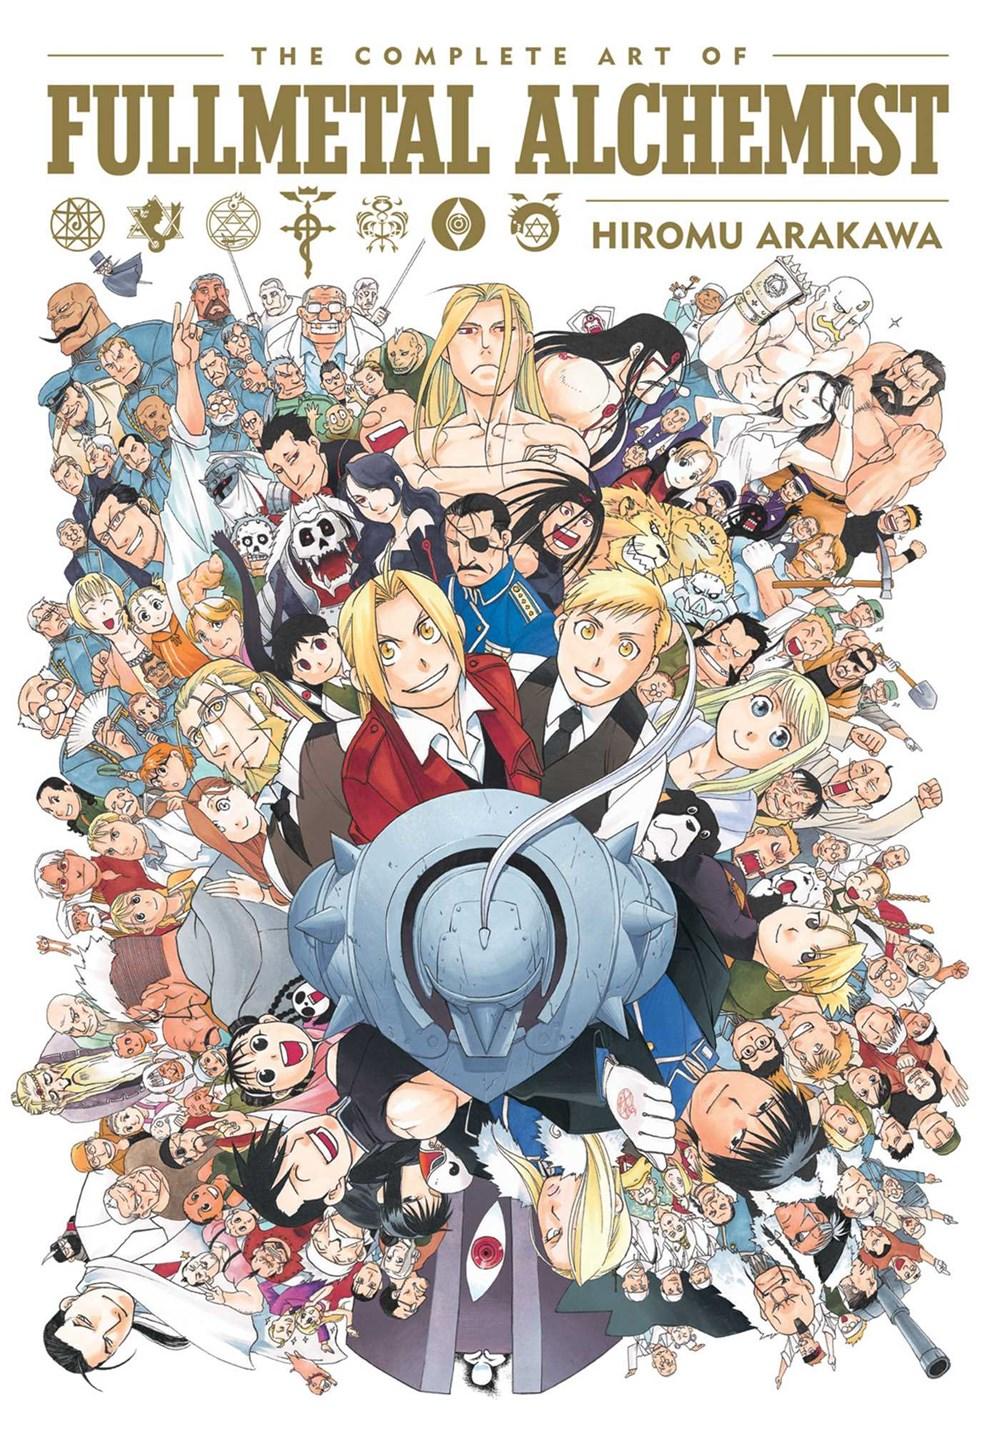 The Complete Art of Fullmetal Alchemist Artbook Review ...